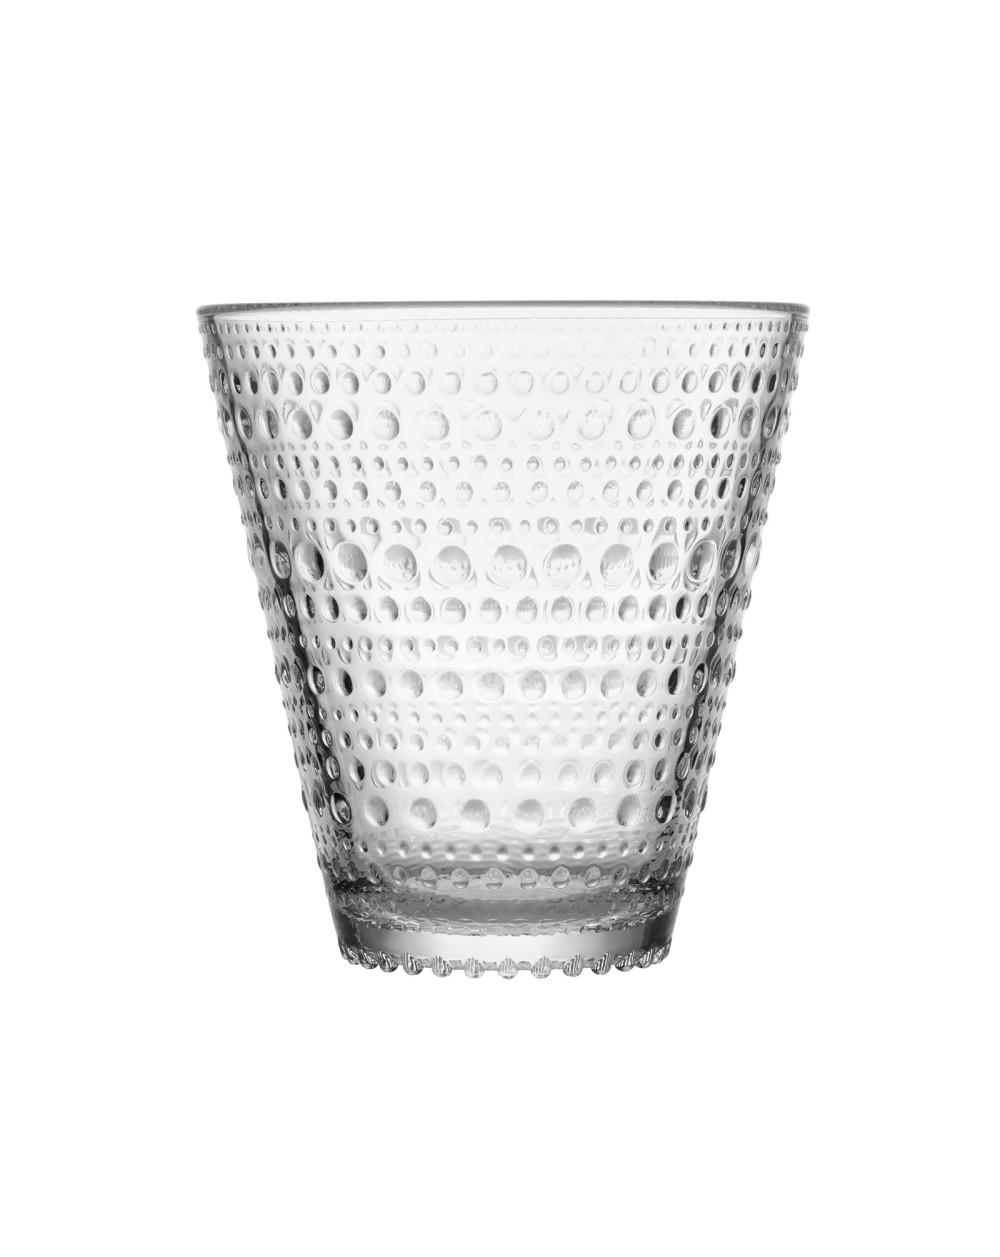 Kastehelmi glass, Iittala